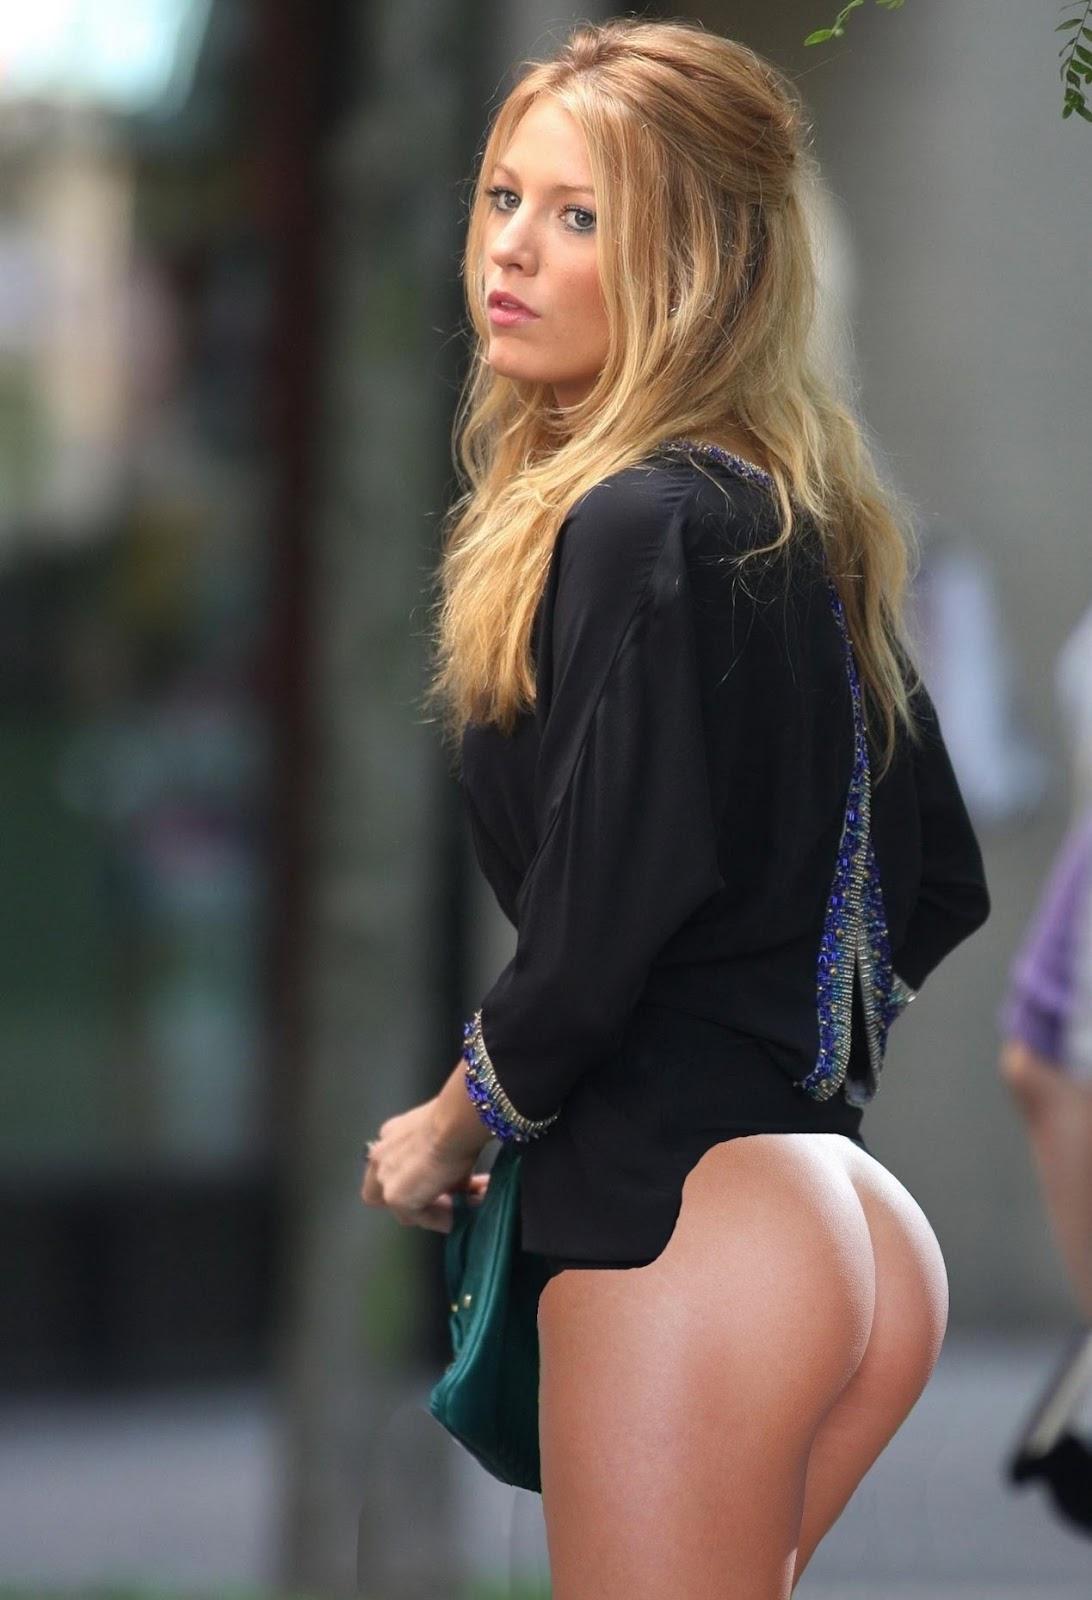 Blake Lively Ass